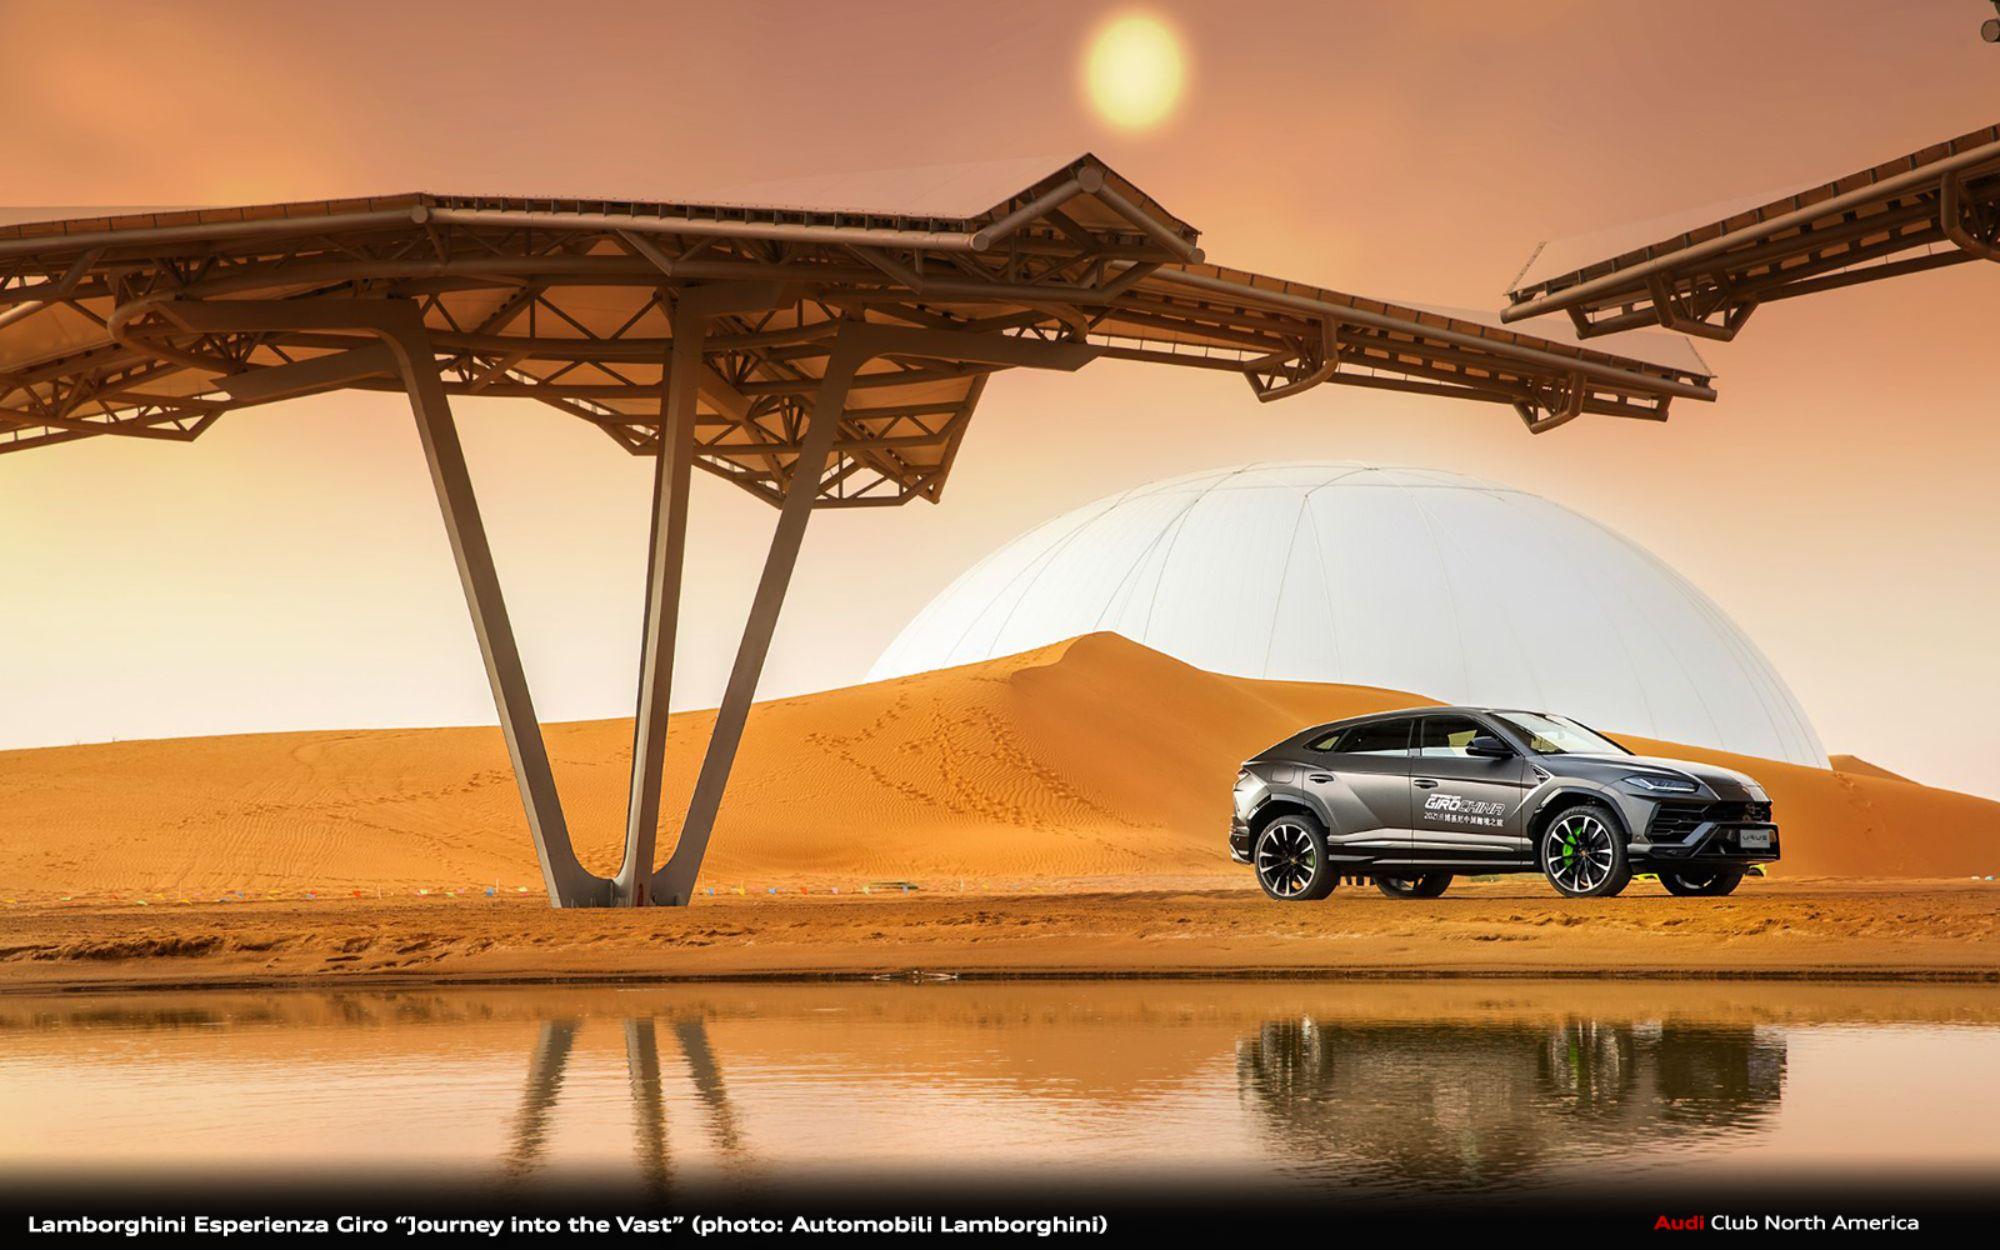 "Lamborghini Esperienza Giro ""Journey into the Vast"" Unparalleled Expedition of 42 Lamborghinis through the North West of China"